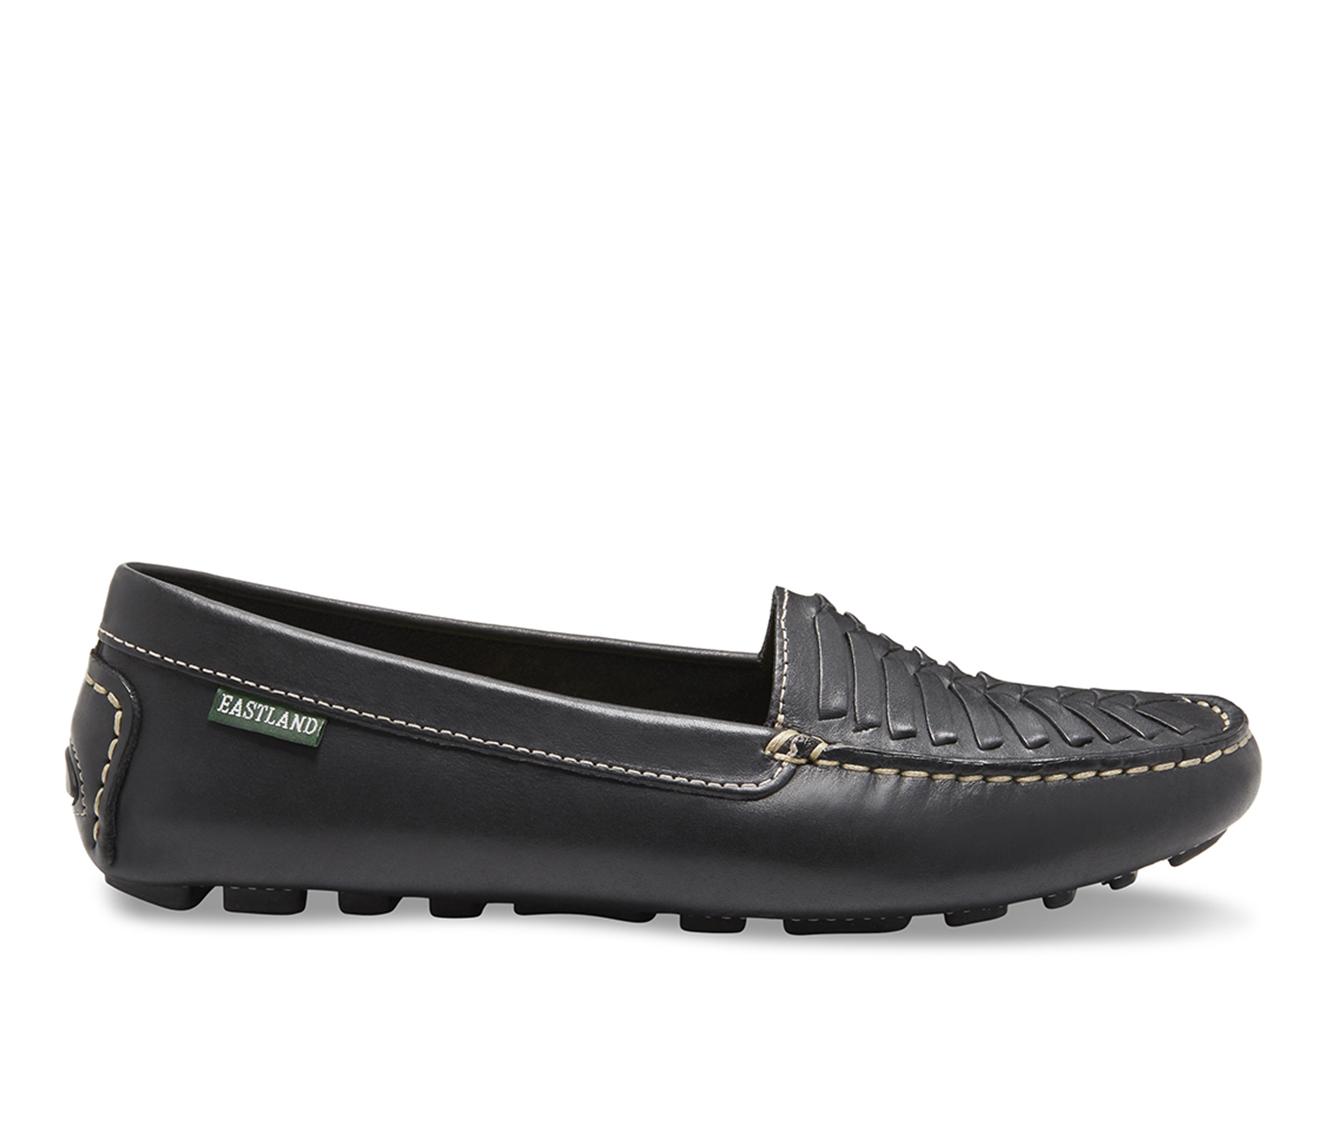 Eastland Debora Women's Shoe (Black Leather)